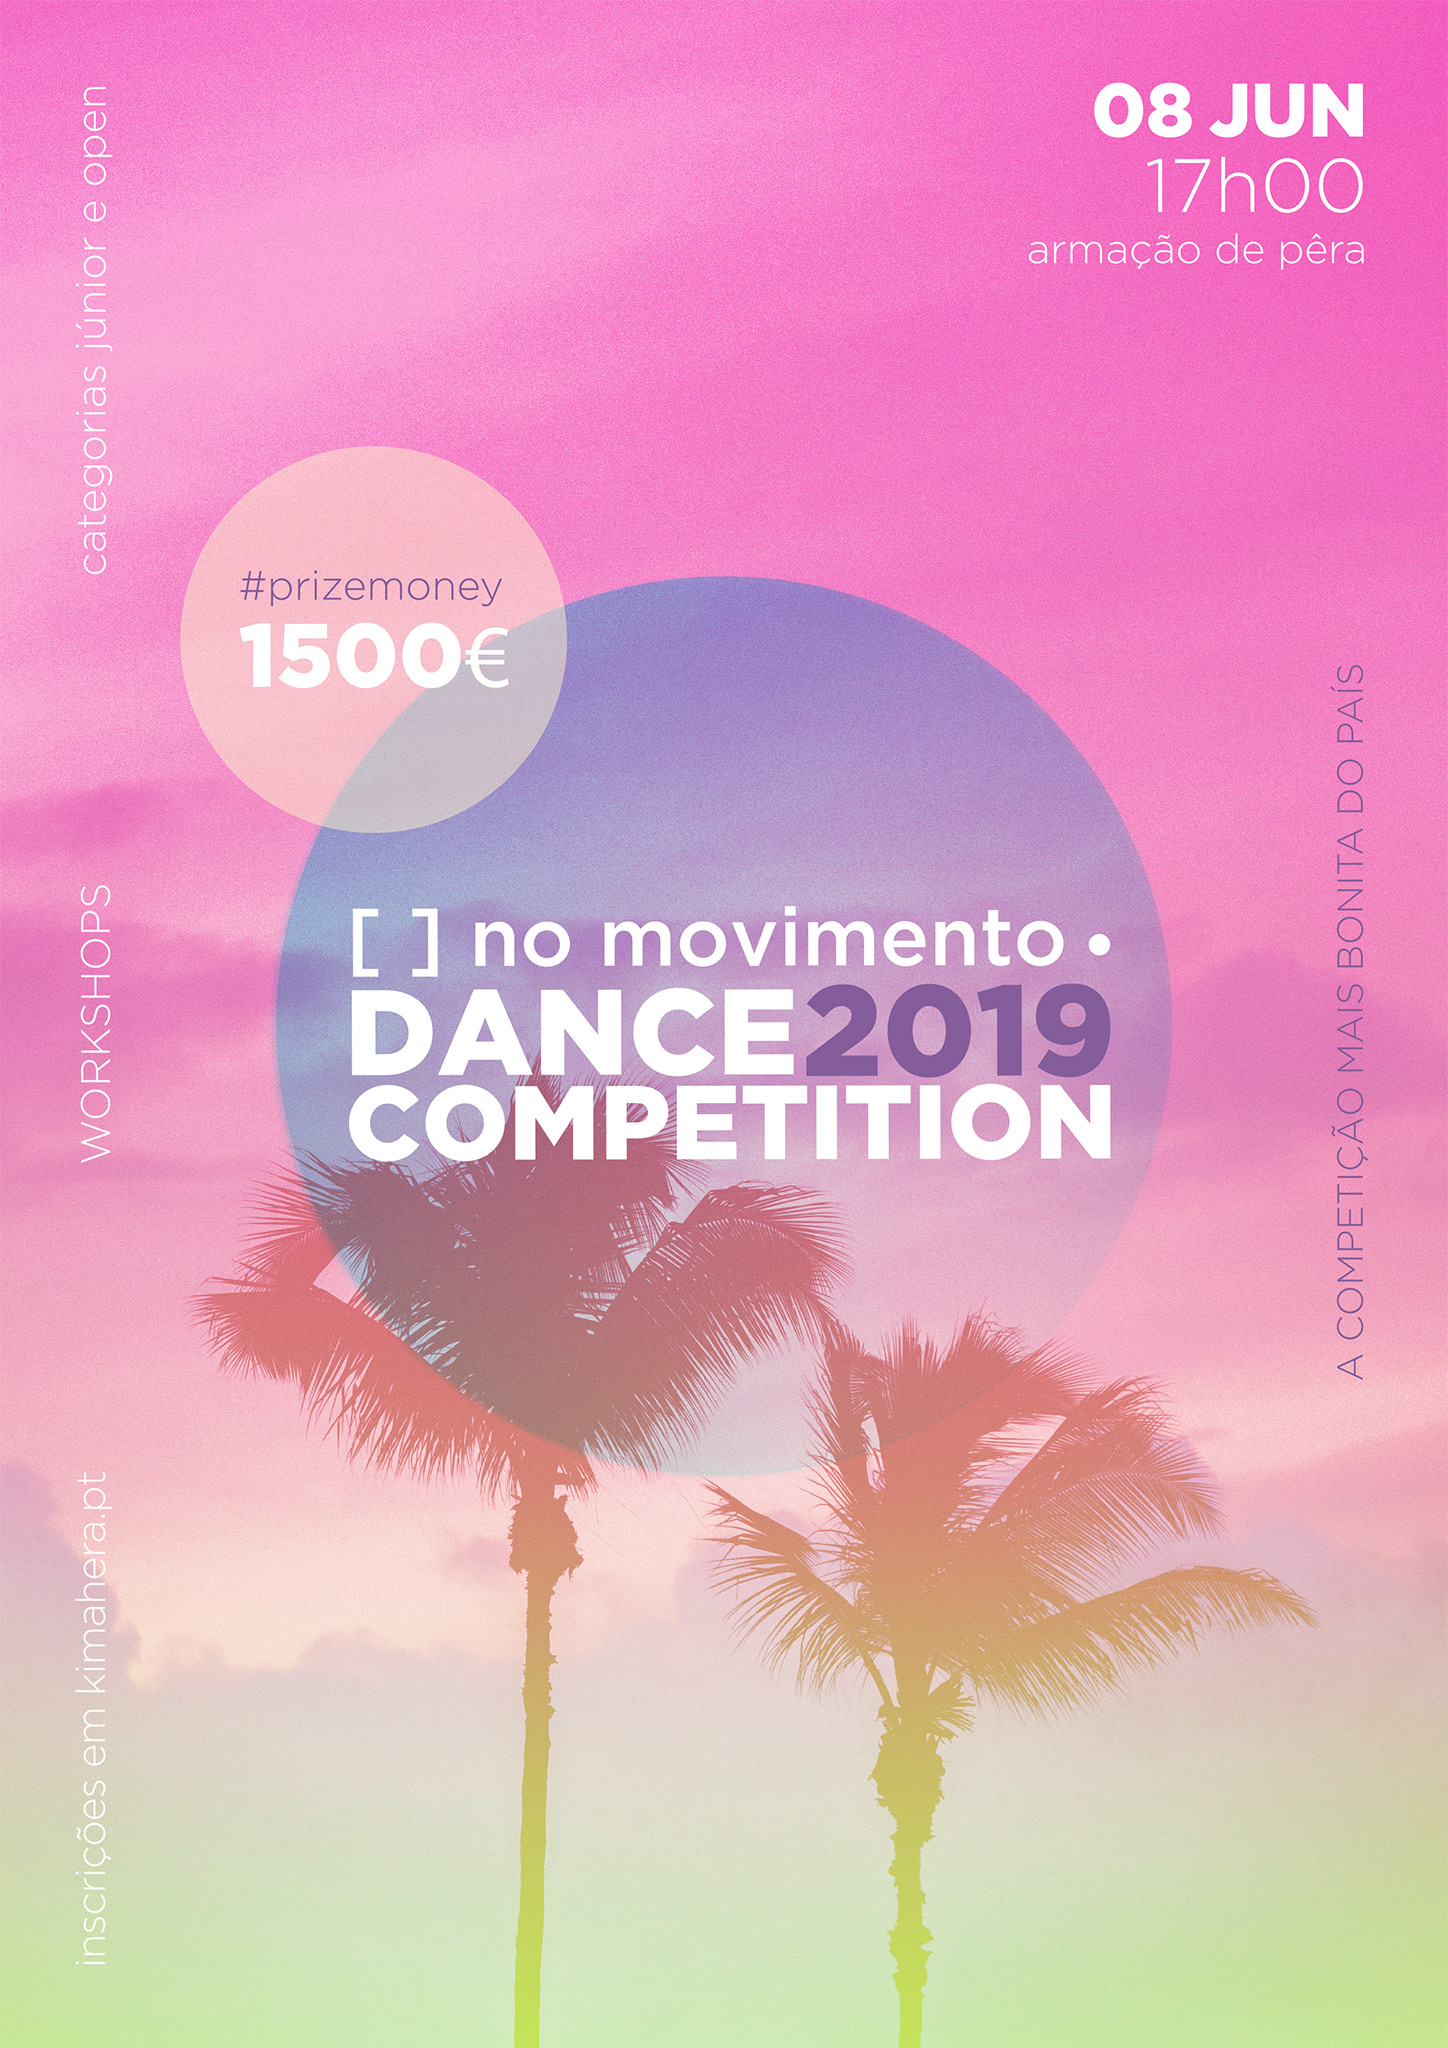 [ ] no movimento • Dance Competition 2019